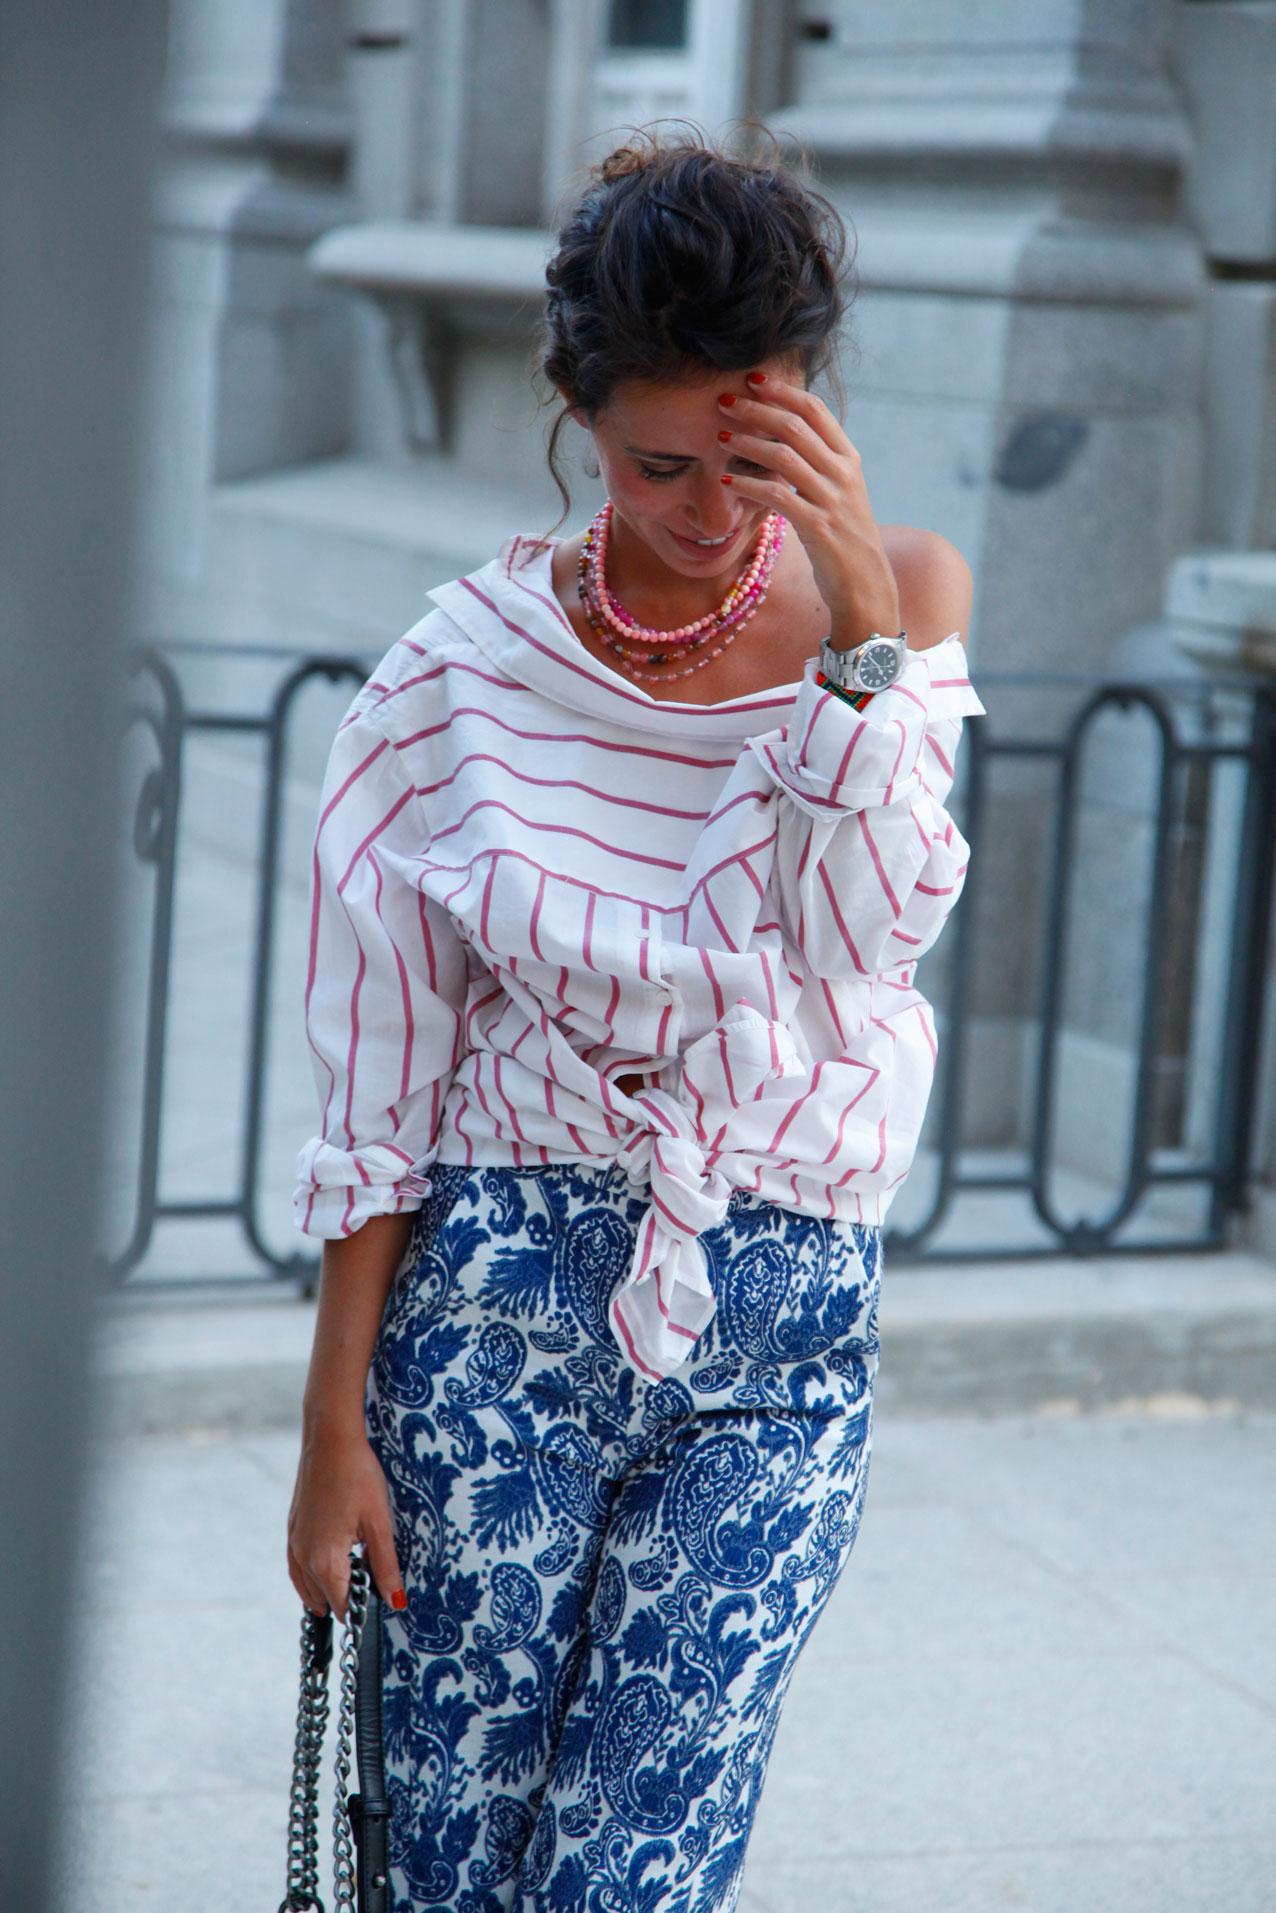 new_shirt-cool_lemonade-tapizado-velvet_platforms-streetstyle2